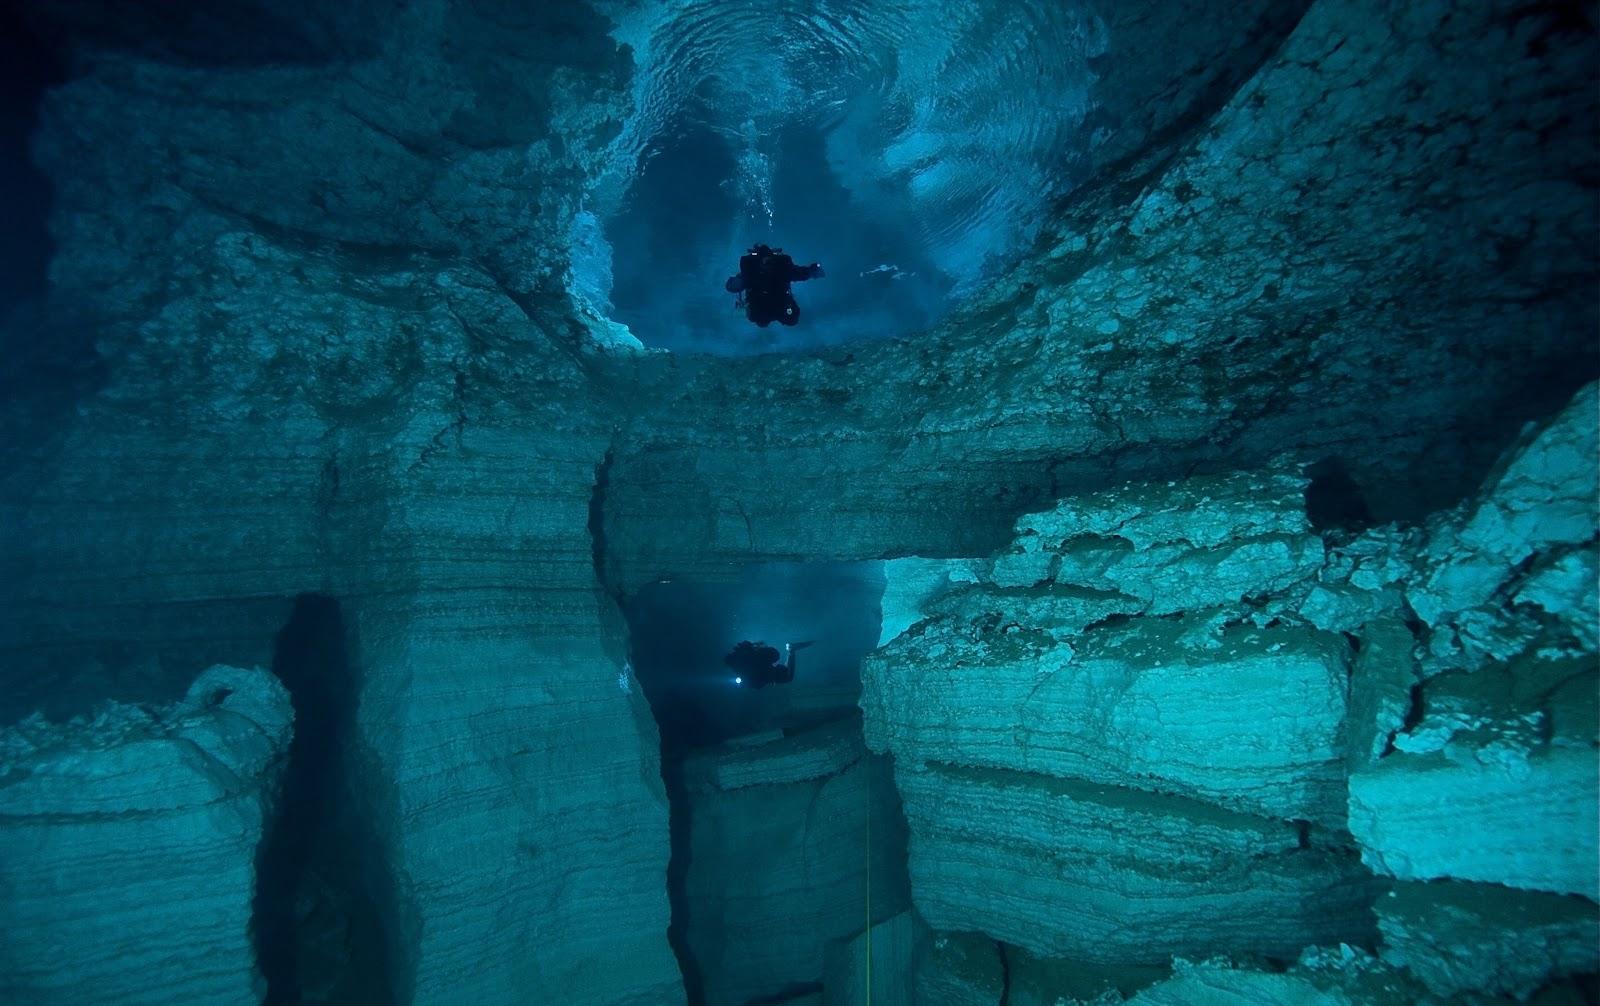 Download Beautiful Nature Cave Diving Wallpaper Full HD Wallpapers 1600x1006